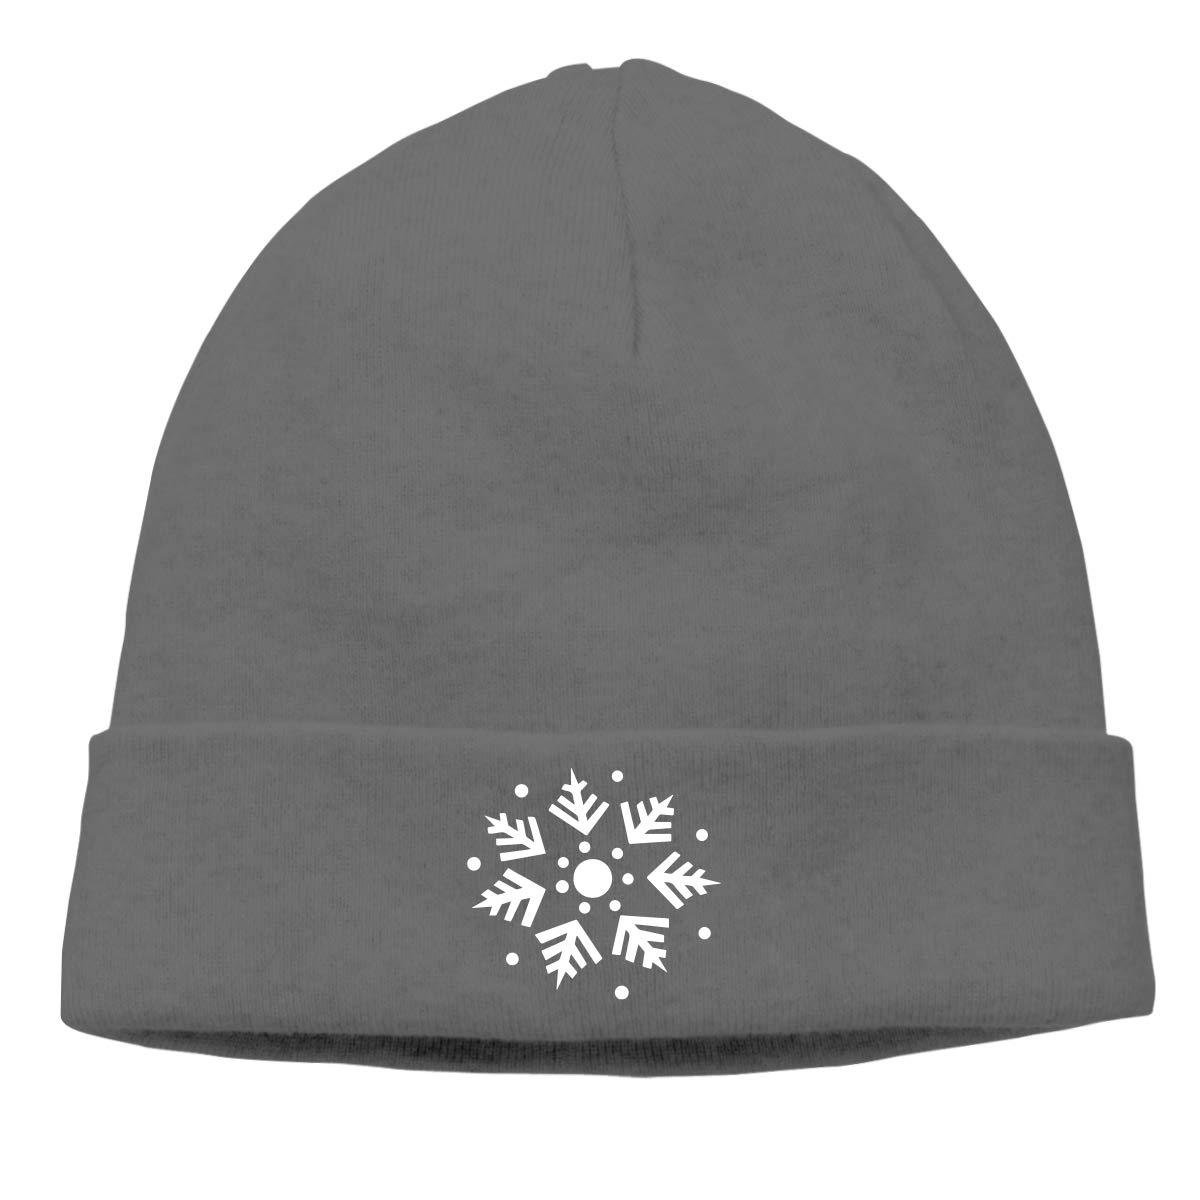 Snowflake Skull Caps Beanie Caps for Men Deep Heather